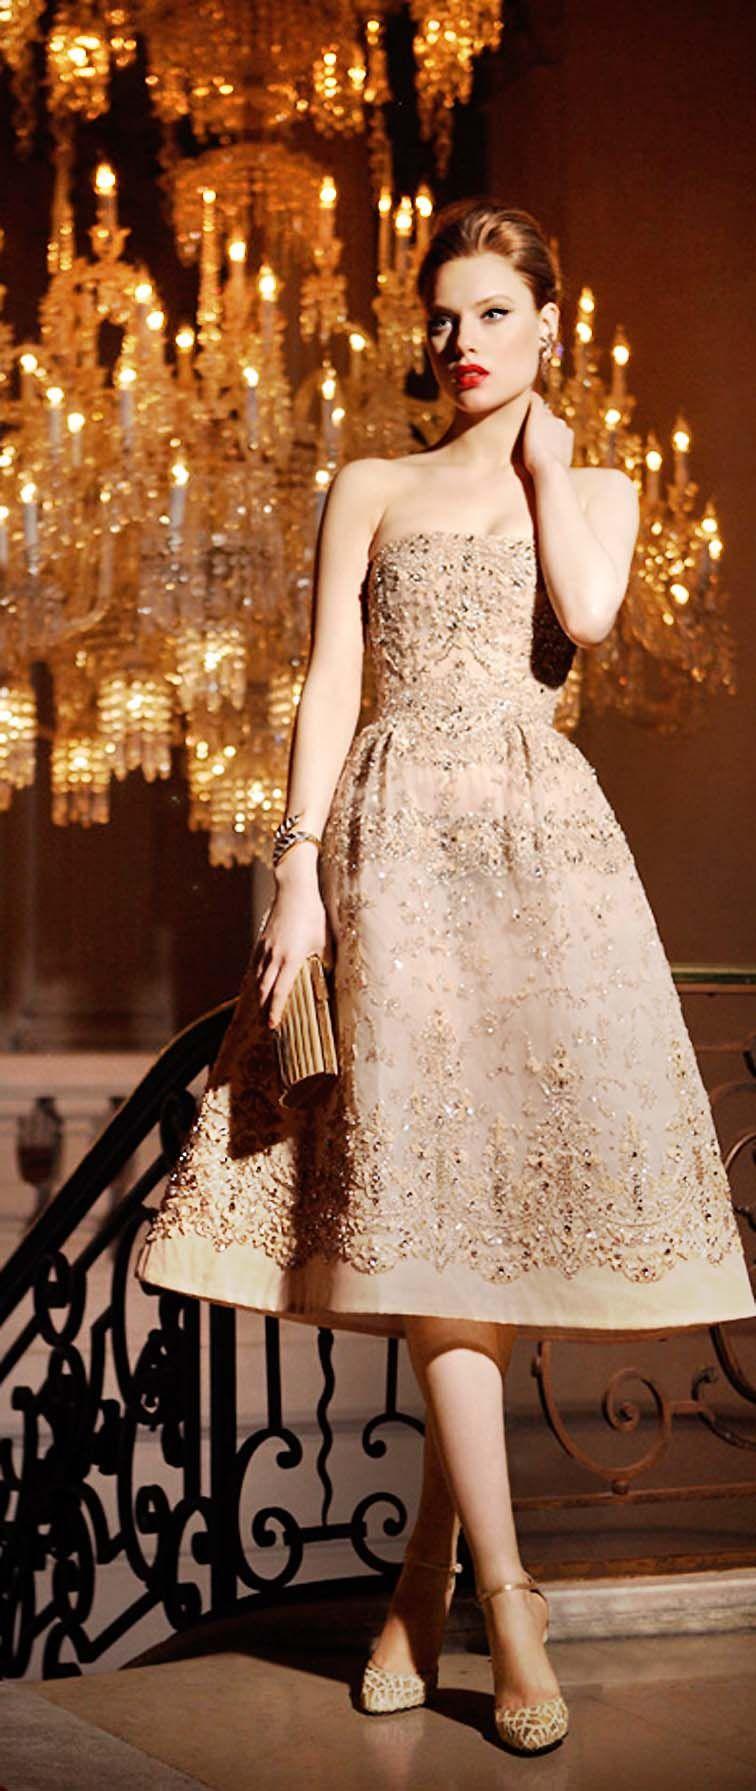 High Society - Mario Sierra | ~LadyLuxuryDesigns | Dresses ...